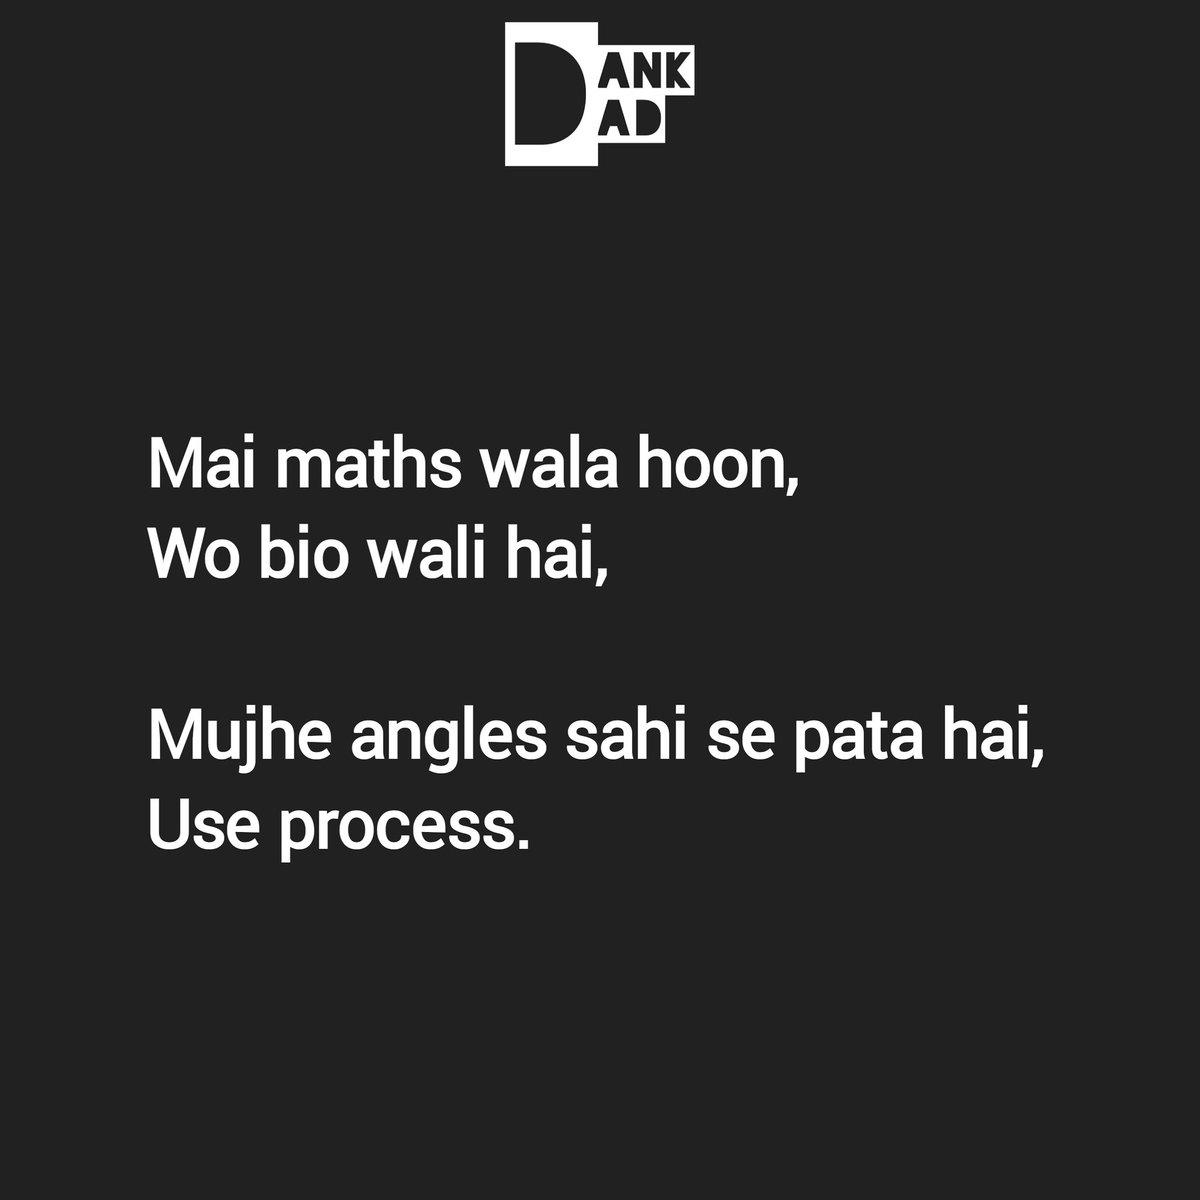 Follow @_dank_dad_ for more ....#fun #jokeoftheday #laugh  #dankjokes #nonvegjokes #follow #funny #jokes #sarcasm #FF #likes #comedyindia #backchodi #sacredmemes #bollywoodpic.twitter.com/KUxq3qS2mm